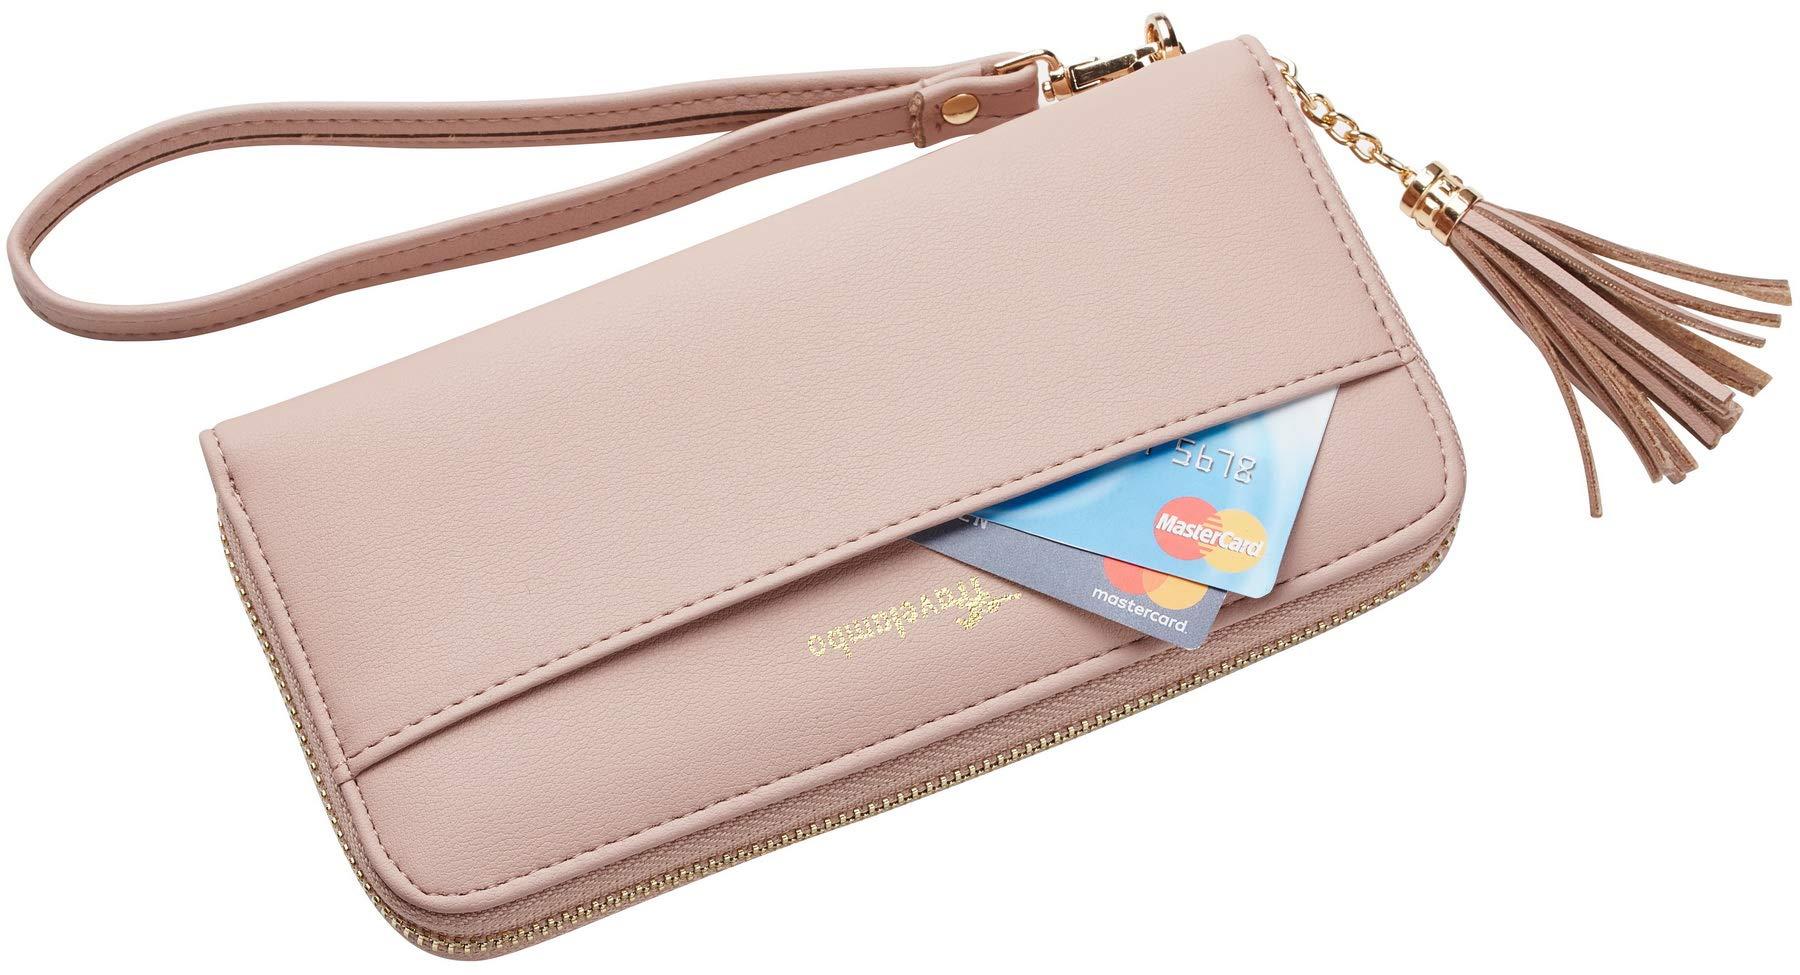 Travelambo Womens Wallet Tassel Bifold Ladies Cluth Wristlet Wrist strap Long Purse (Access Pink Champagne) by Travelambo (Image #3)